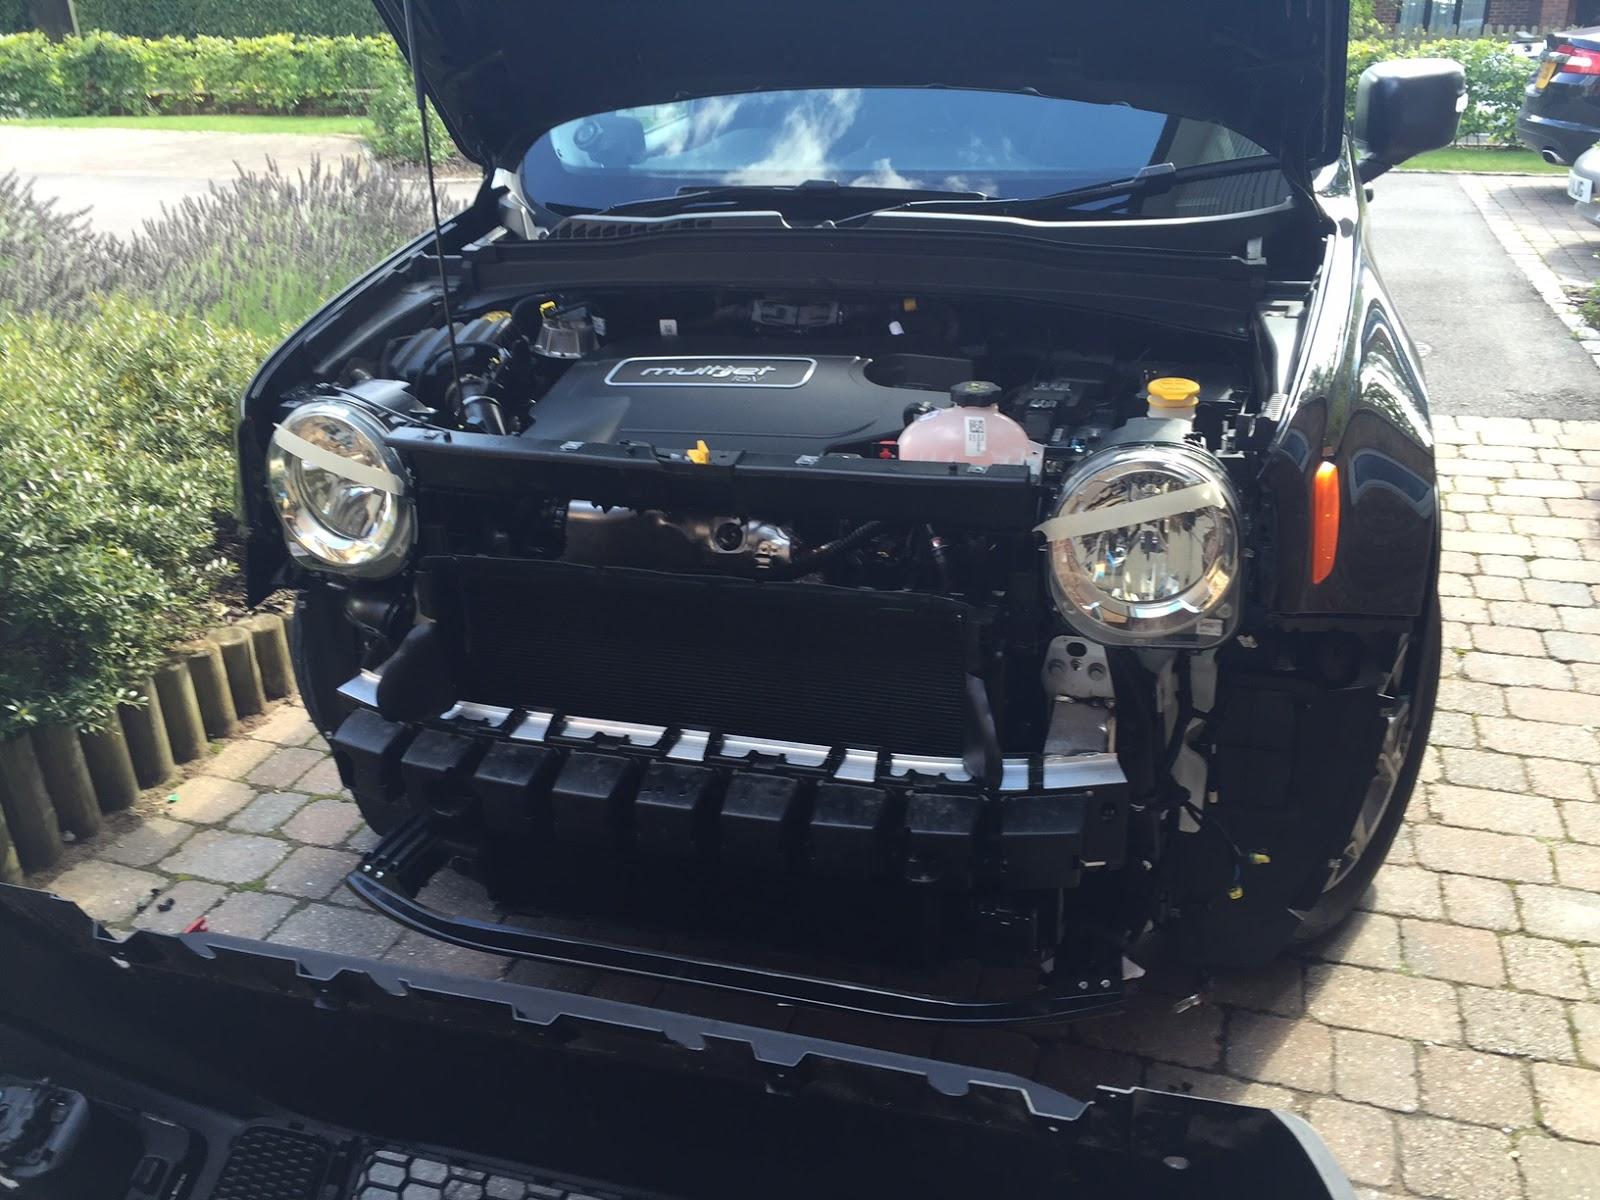 Jeep Liberty Grill